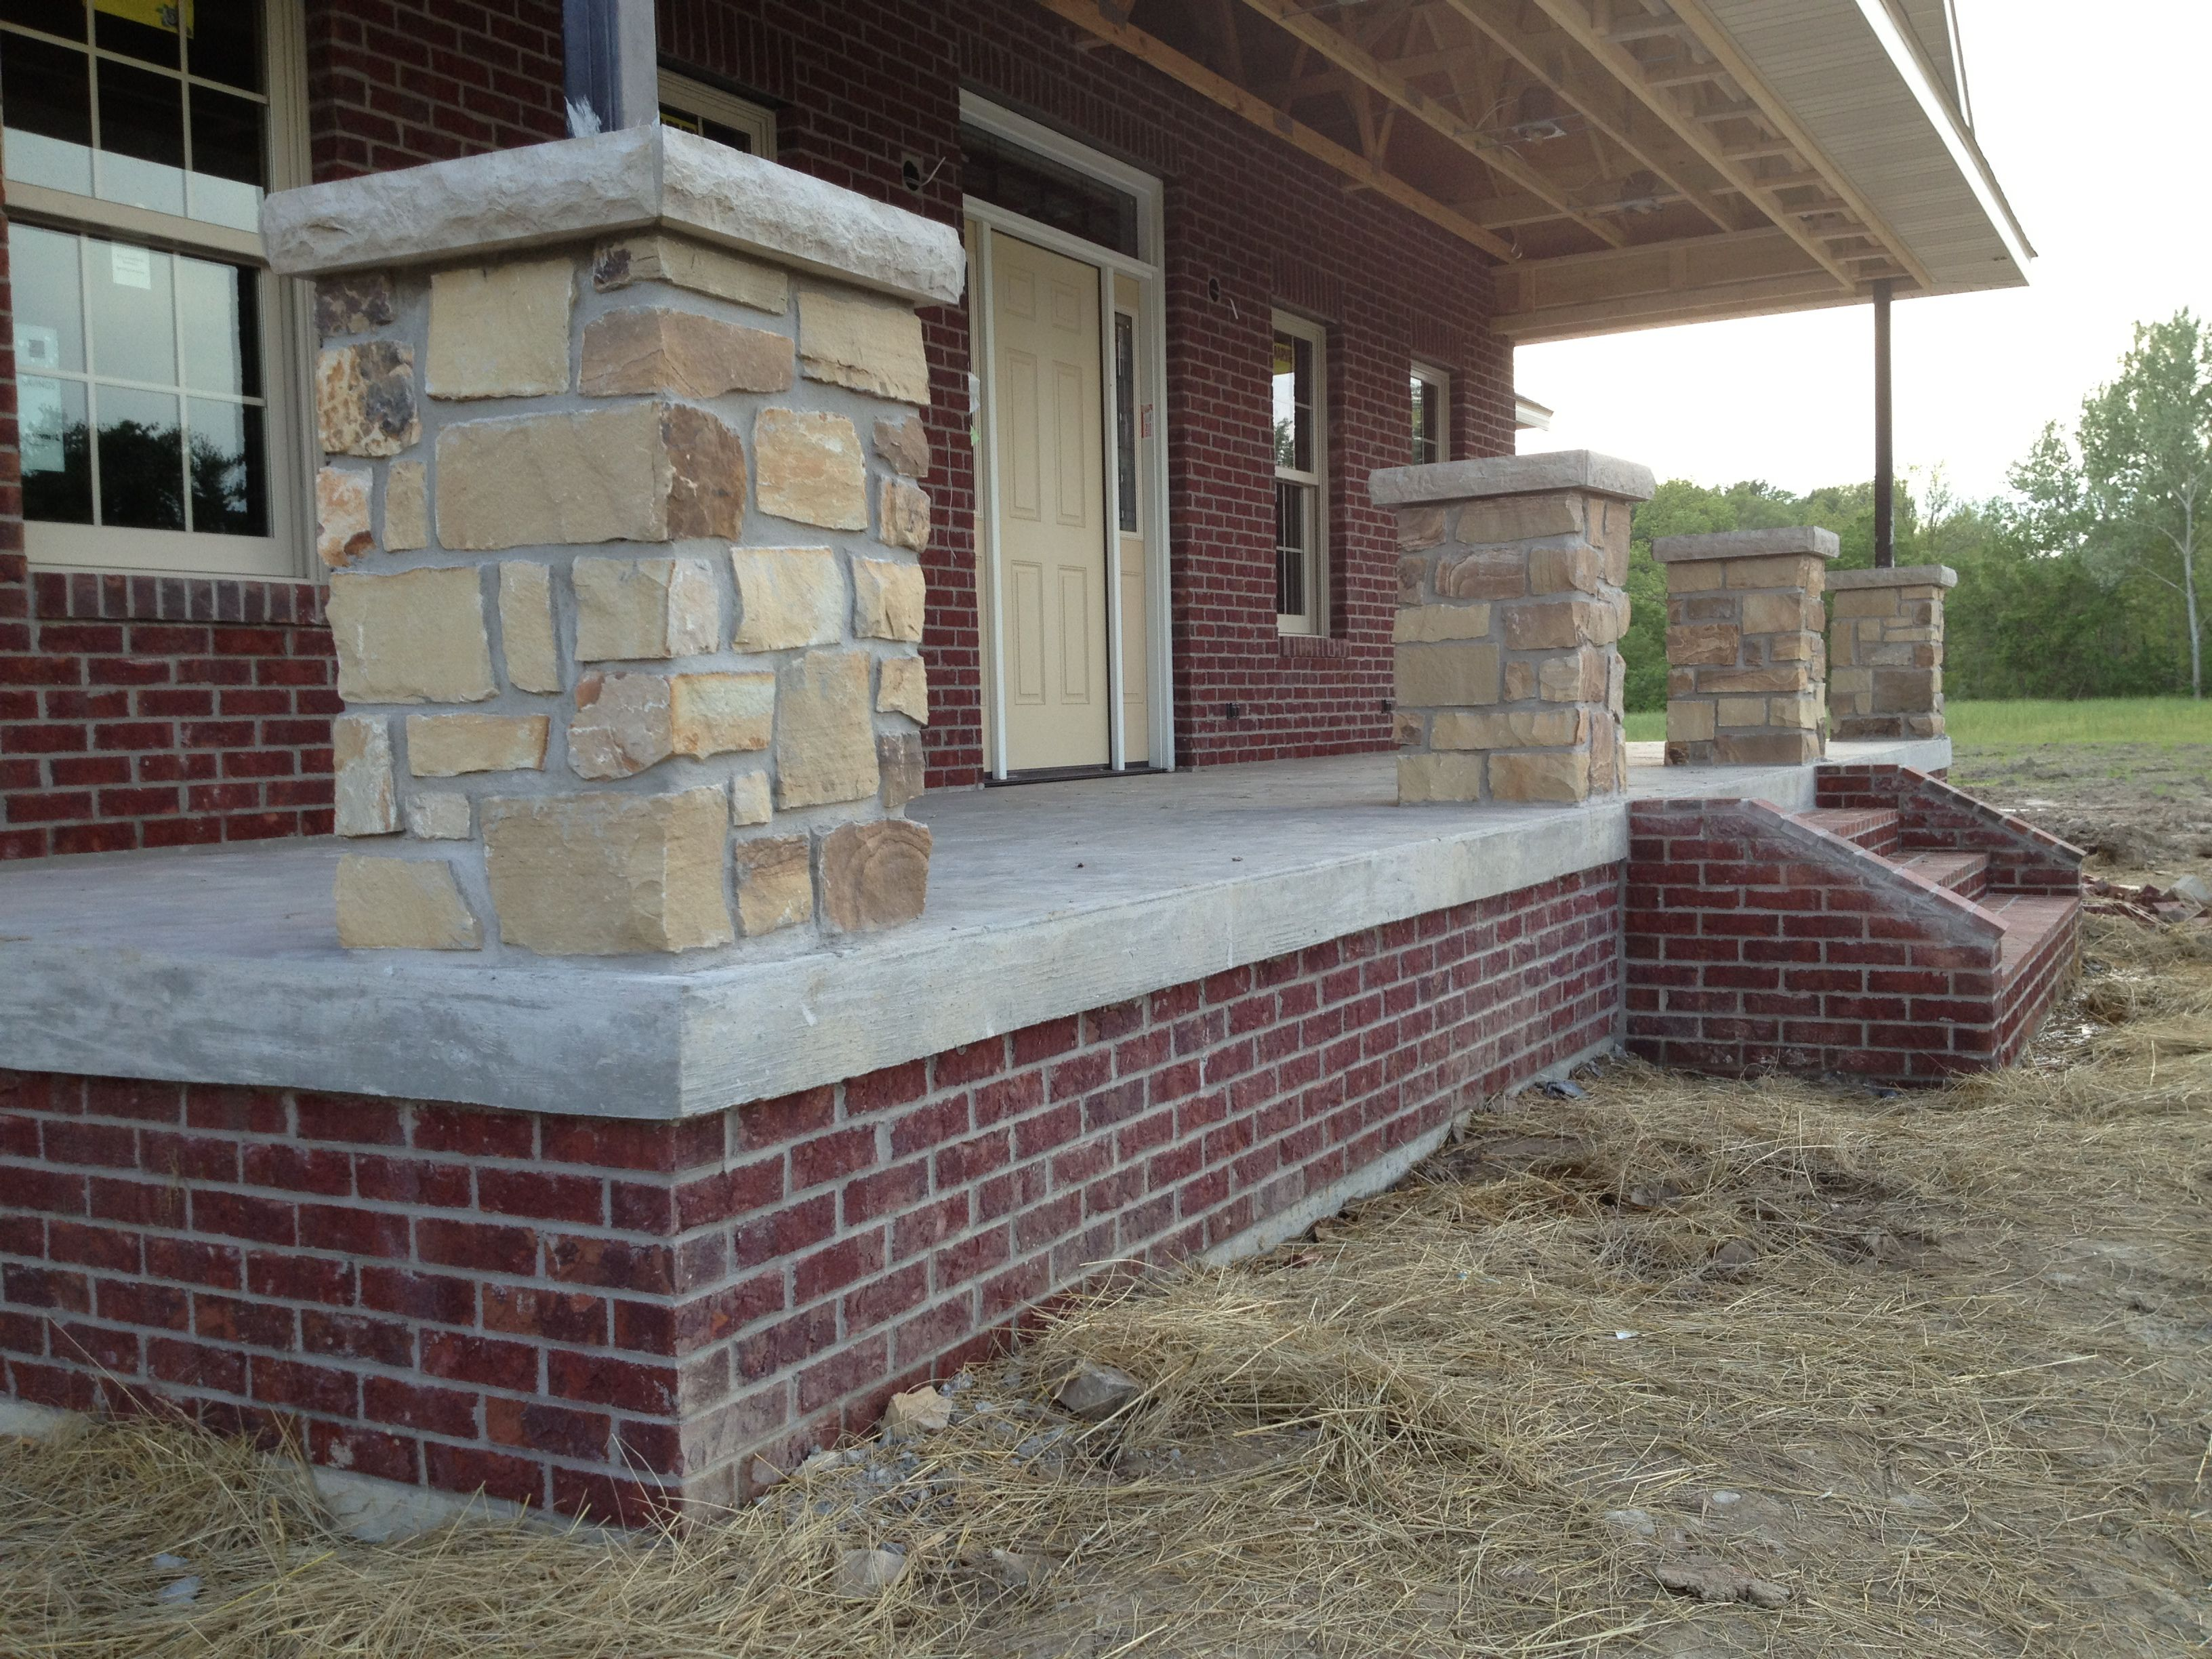 Brick And Stone Pillars : Stone porch column with dark red brick my dream home